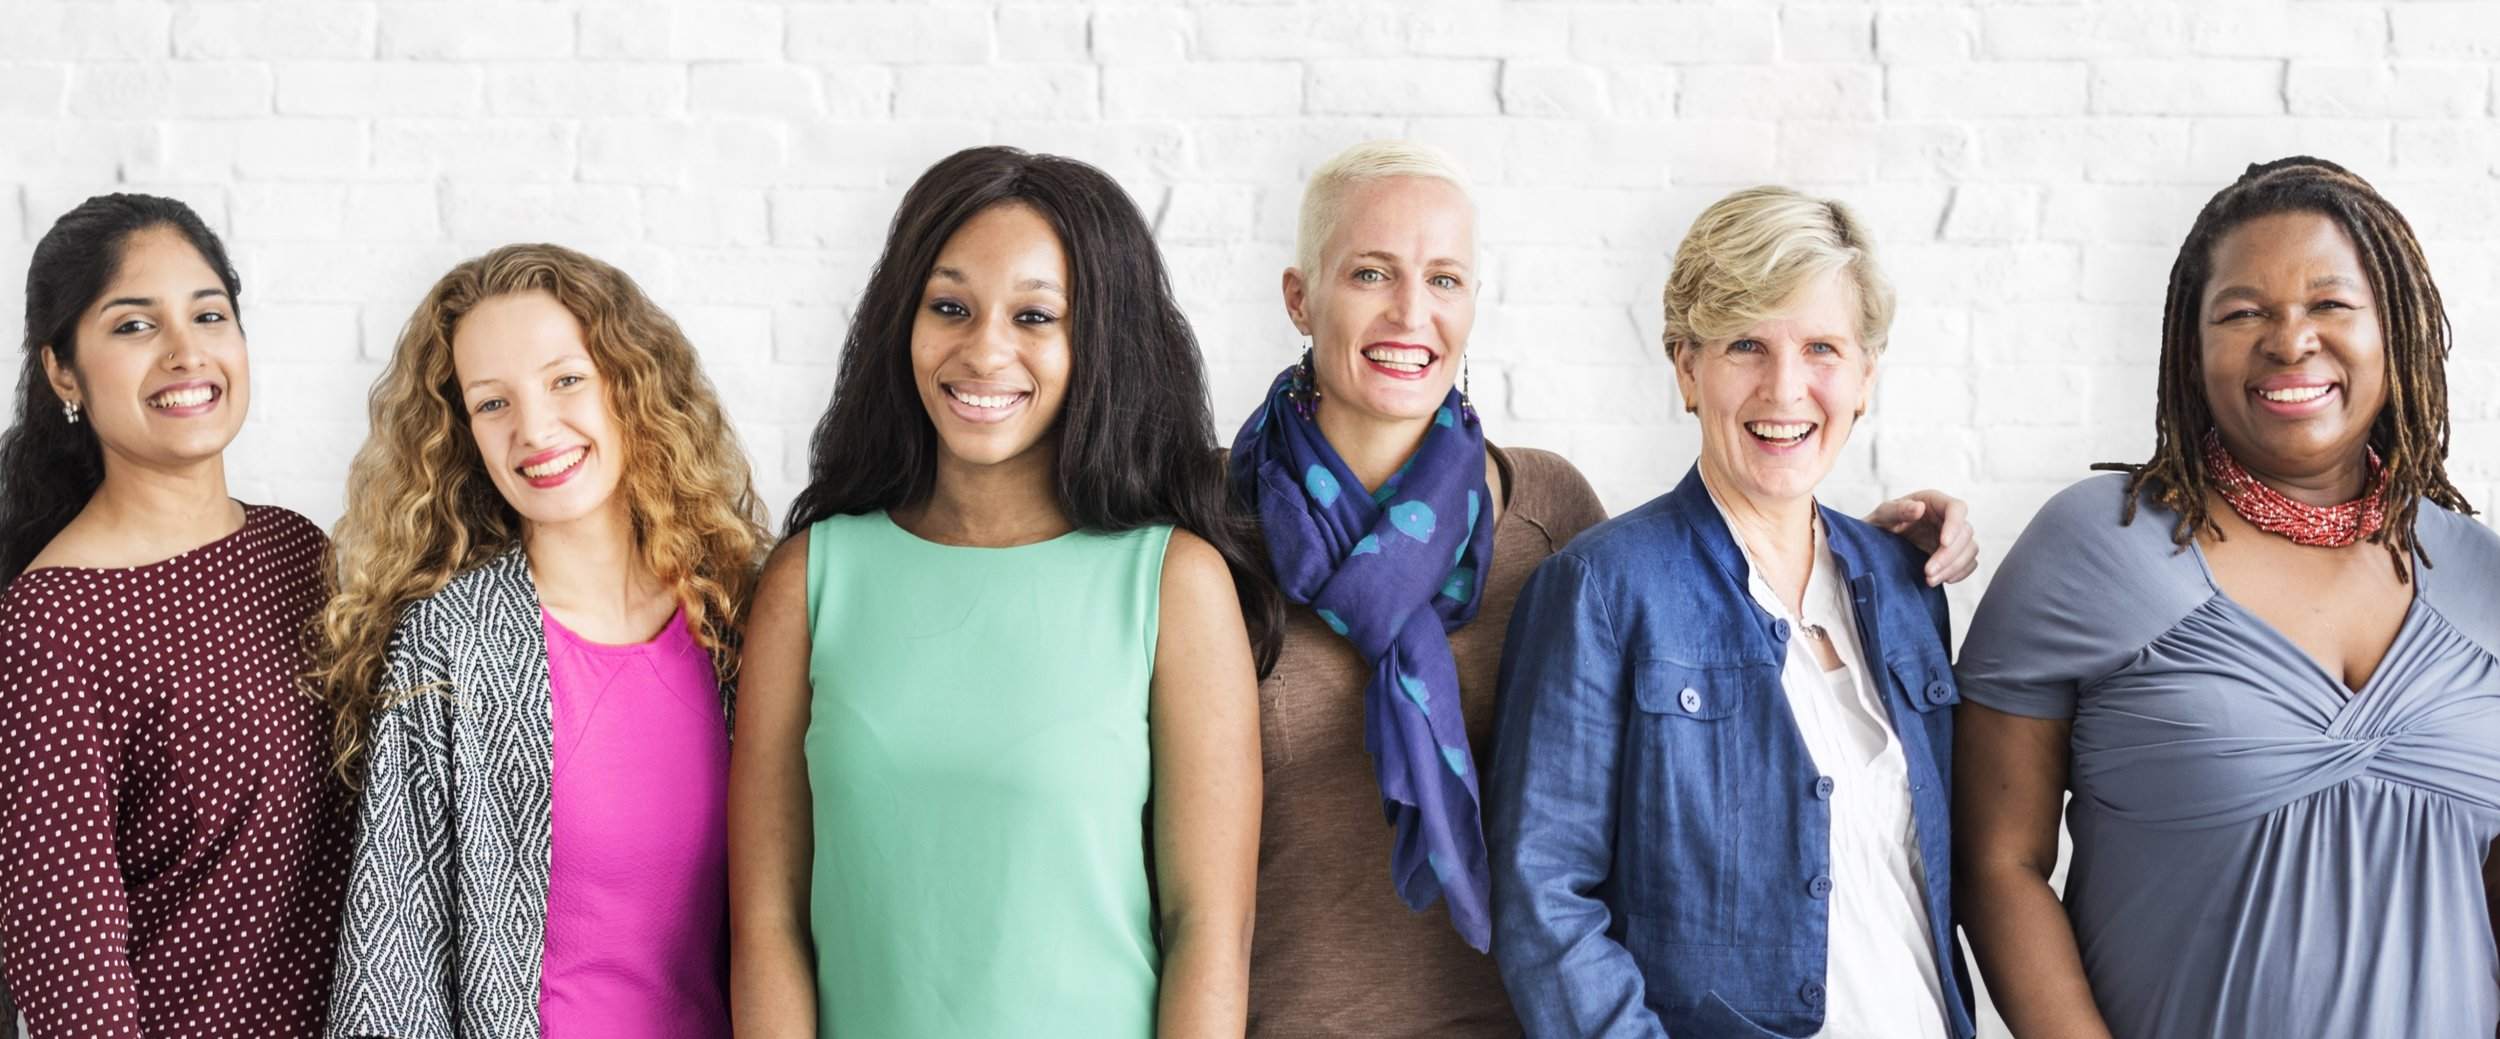 iStock-group of women-615106468.jpg